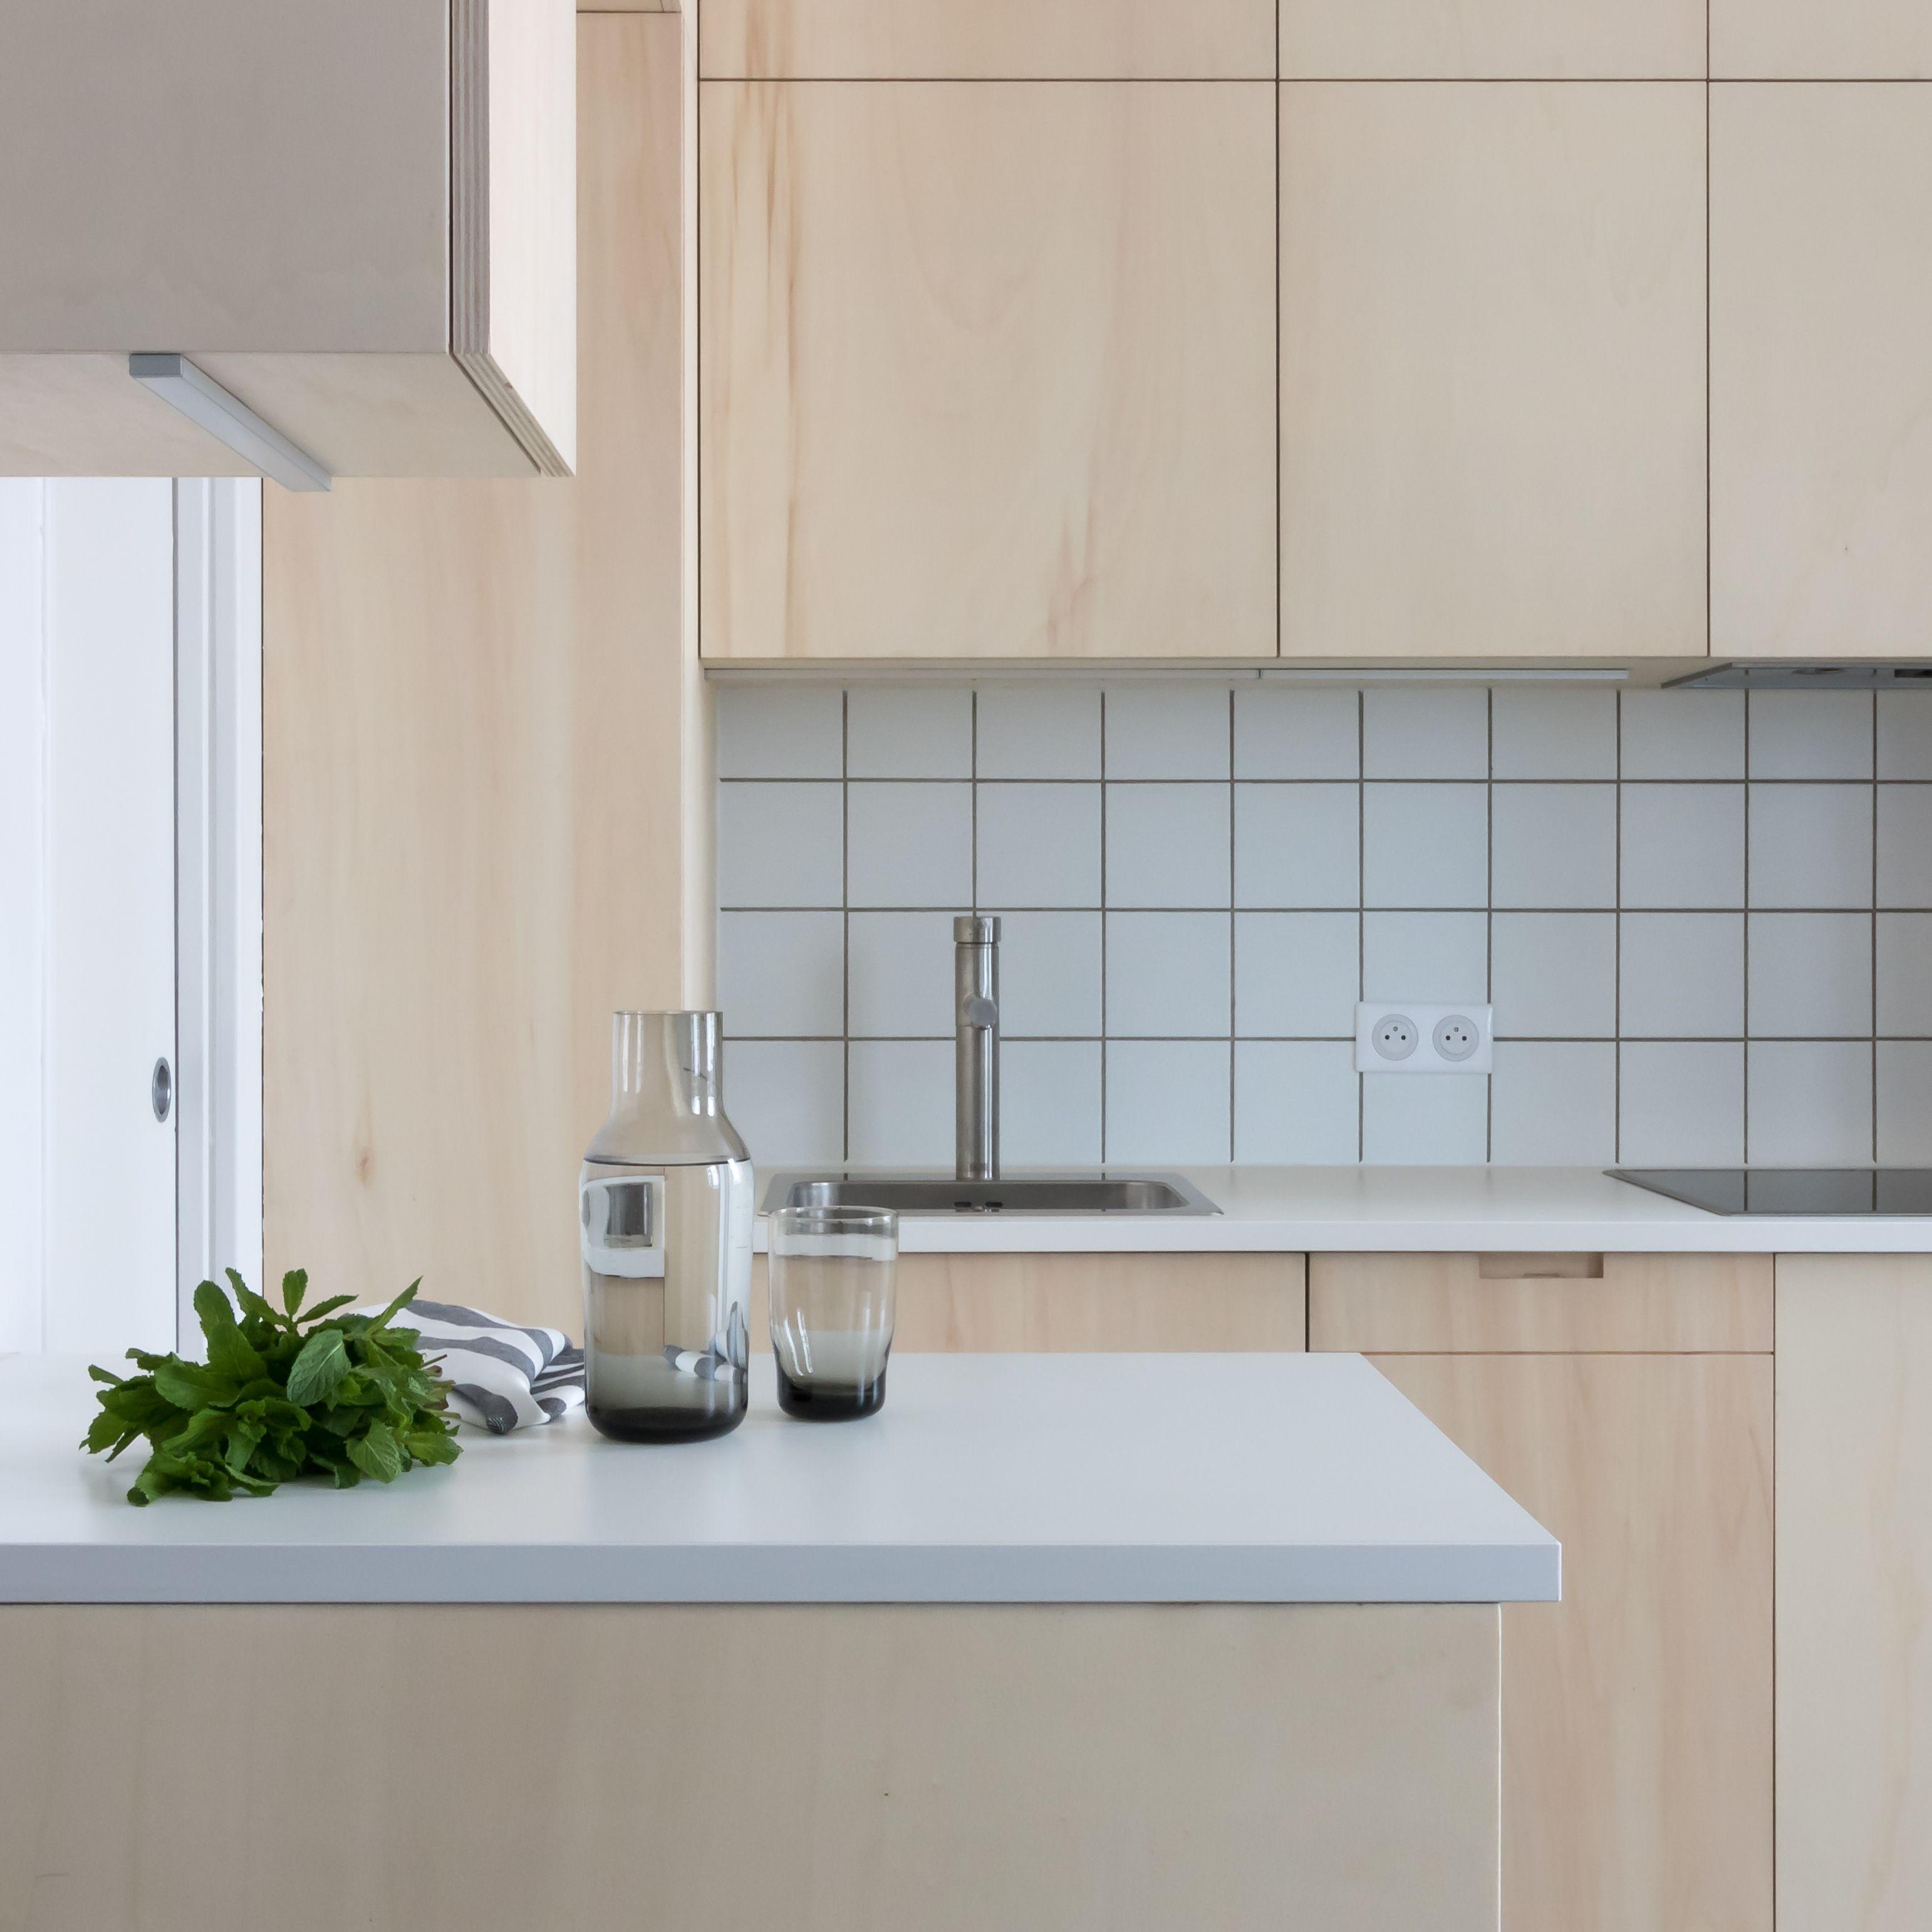 KITCHEN INSPIRATION - Interior Design and Home Decor Ideas You\'ll ...